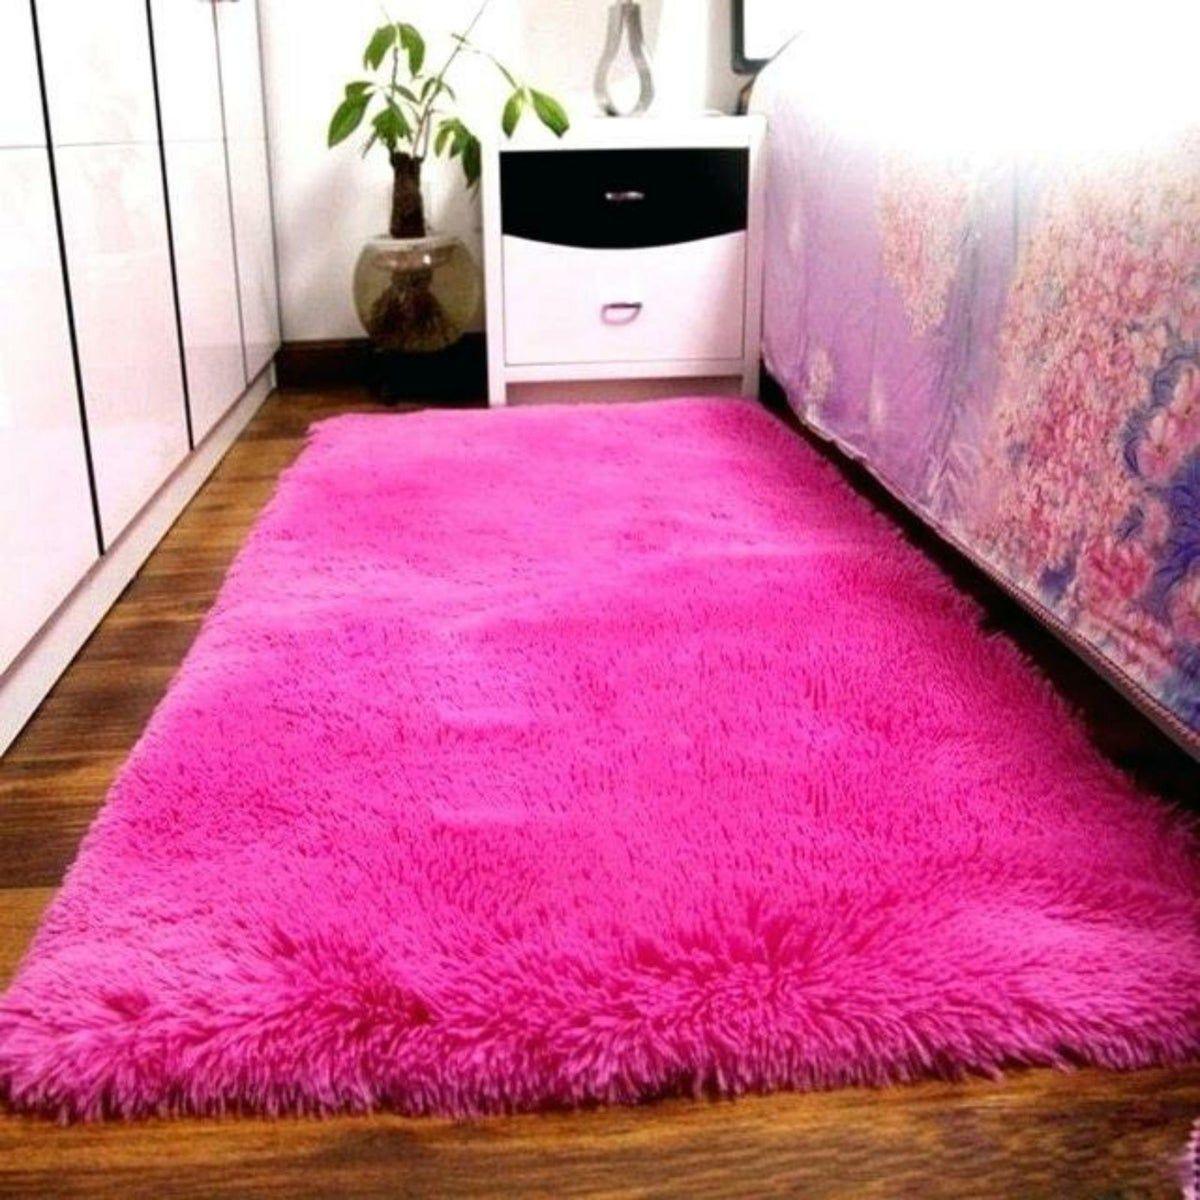 Hot Pink Faux Fur Runner 3 X5 Area Rug In 2020 Rugs On Carpet Room Carpet Cool Rugs